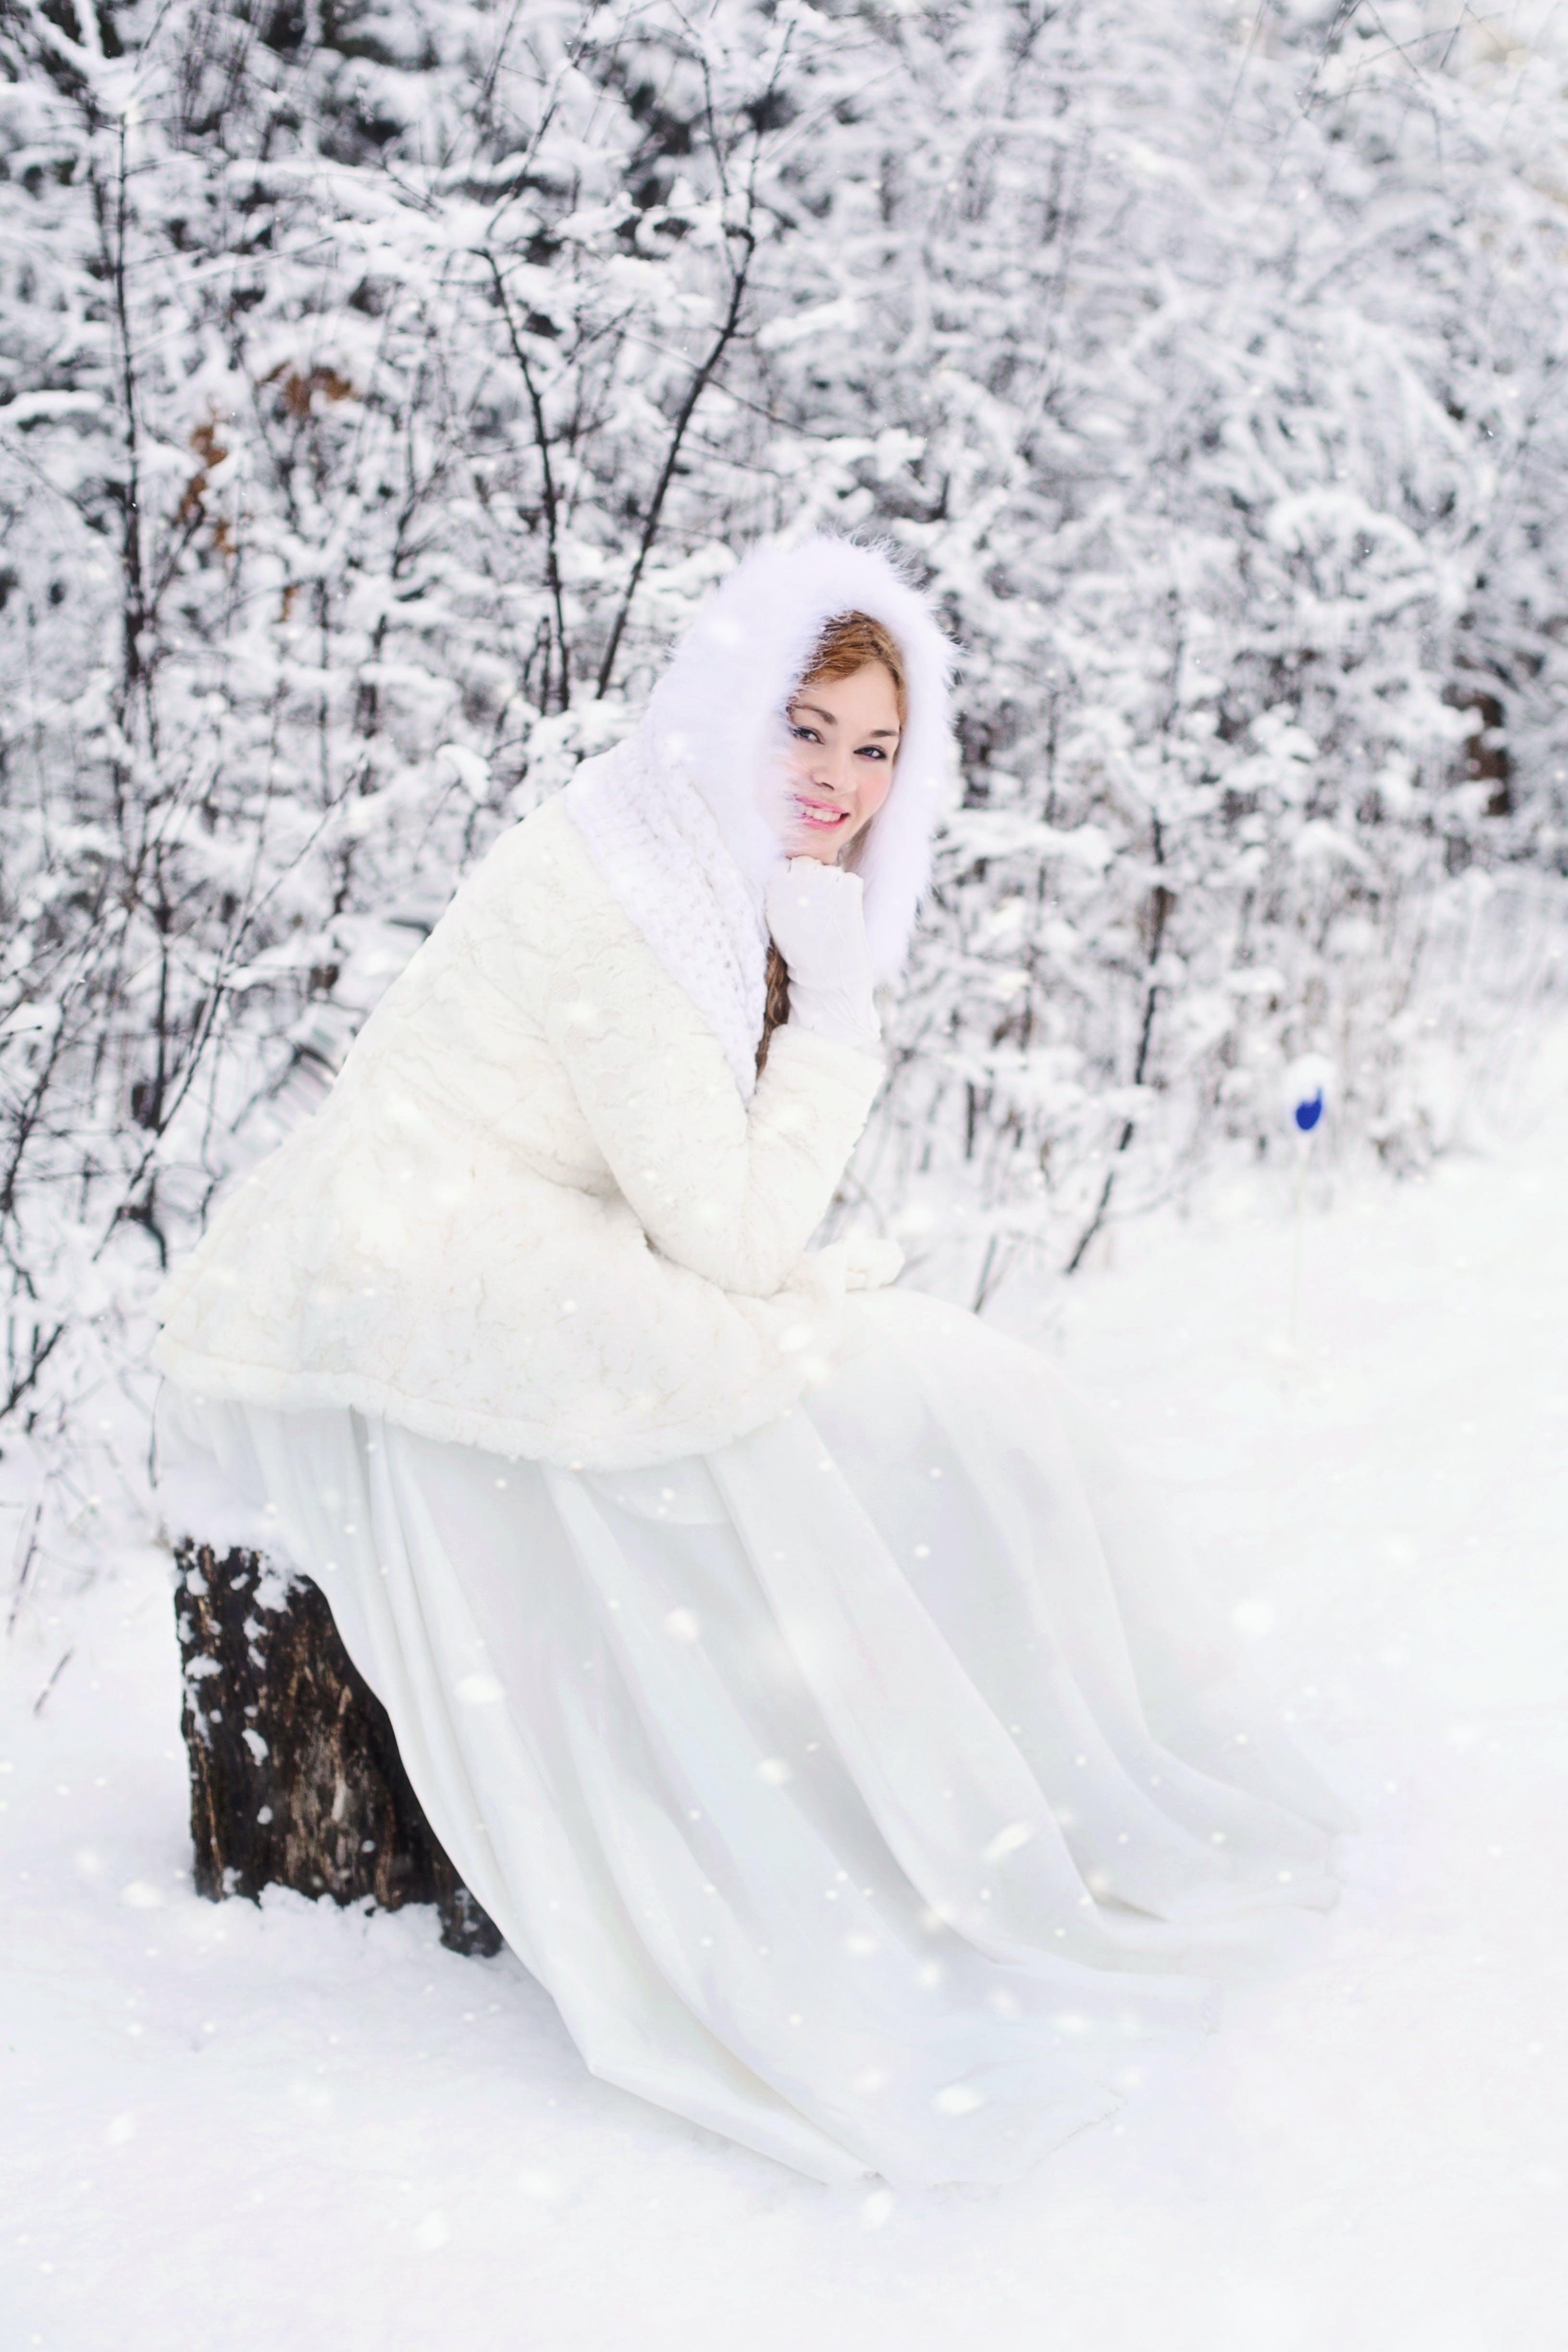 Kostenloses Stock Foto zu frau, kalt, model, person